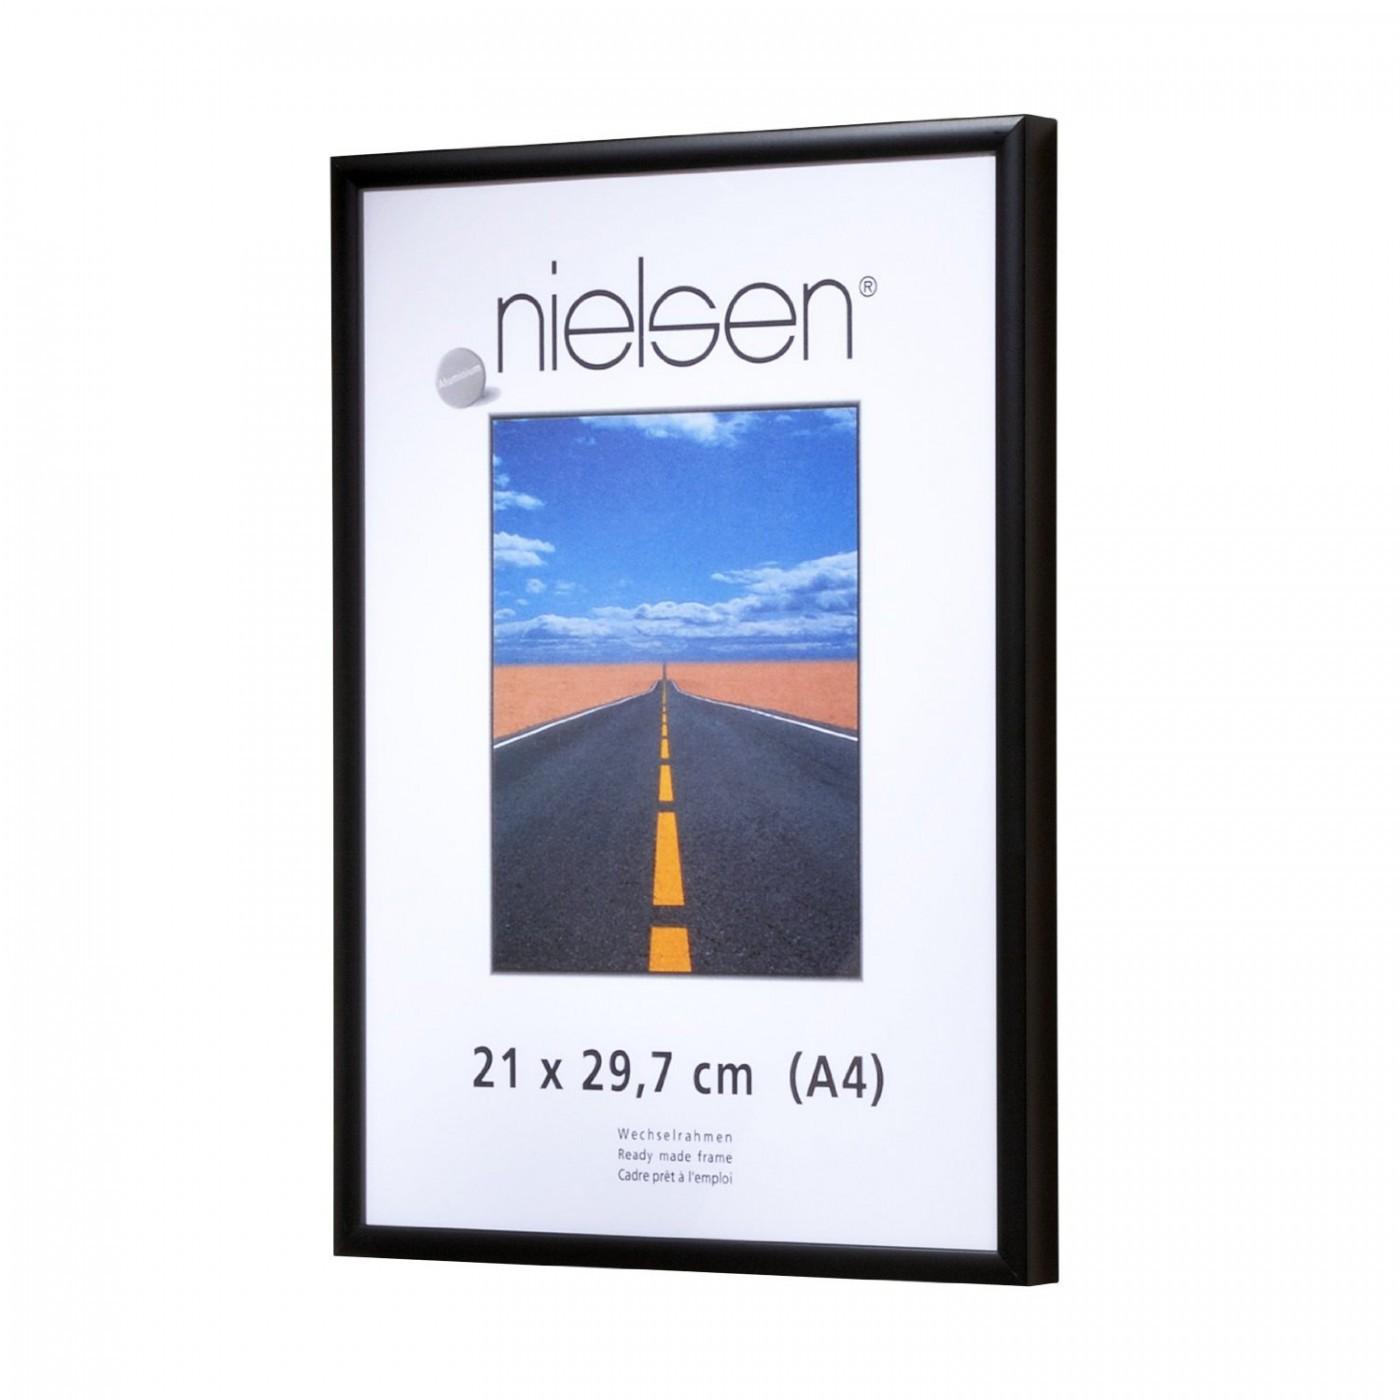 NIELSEN Pearl Perspex 84x118 cm A0 Matt Black Picture Frame ...